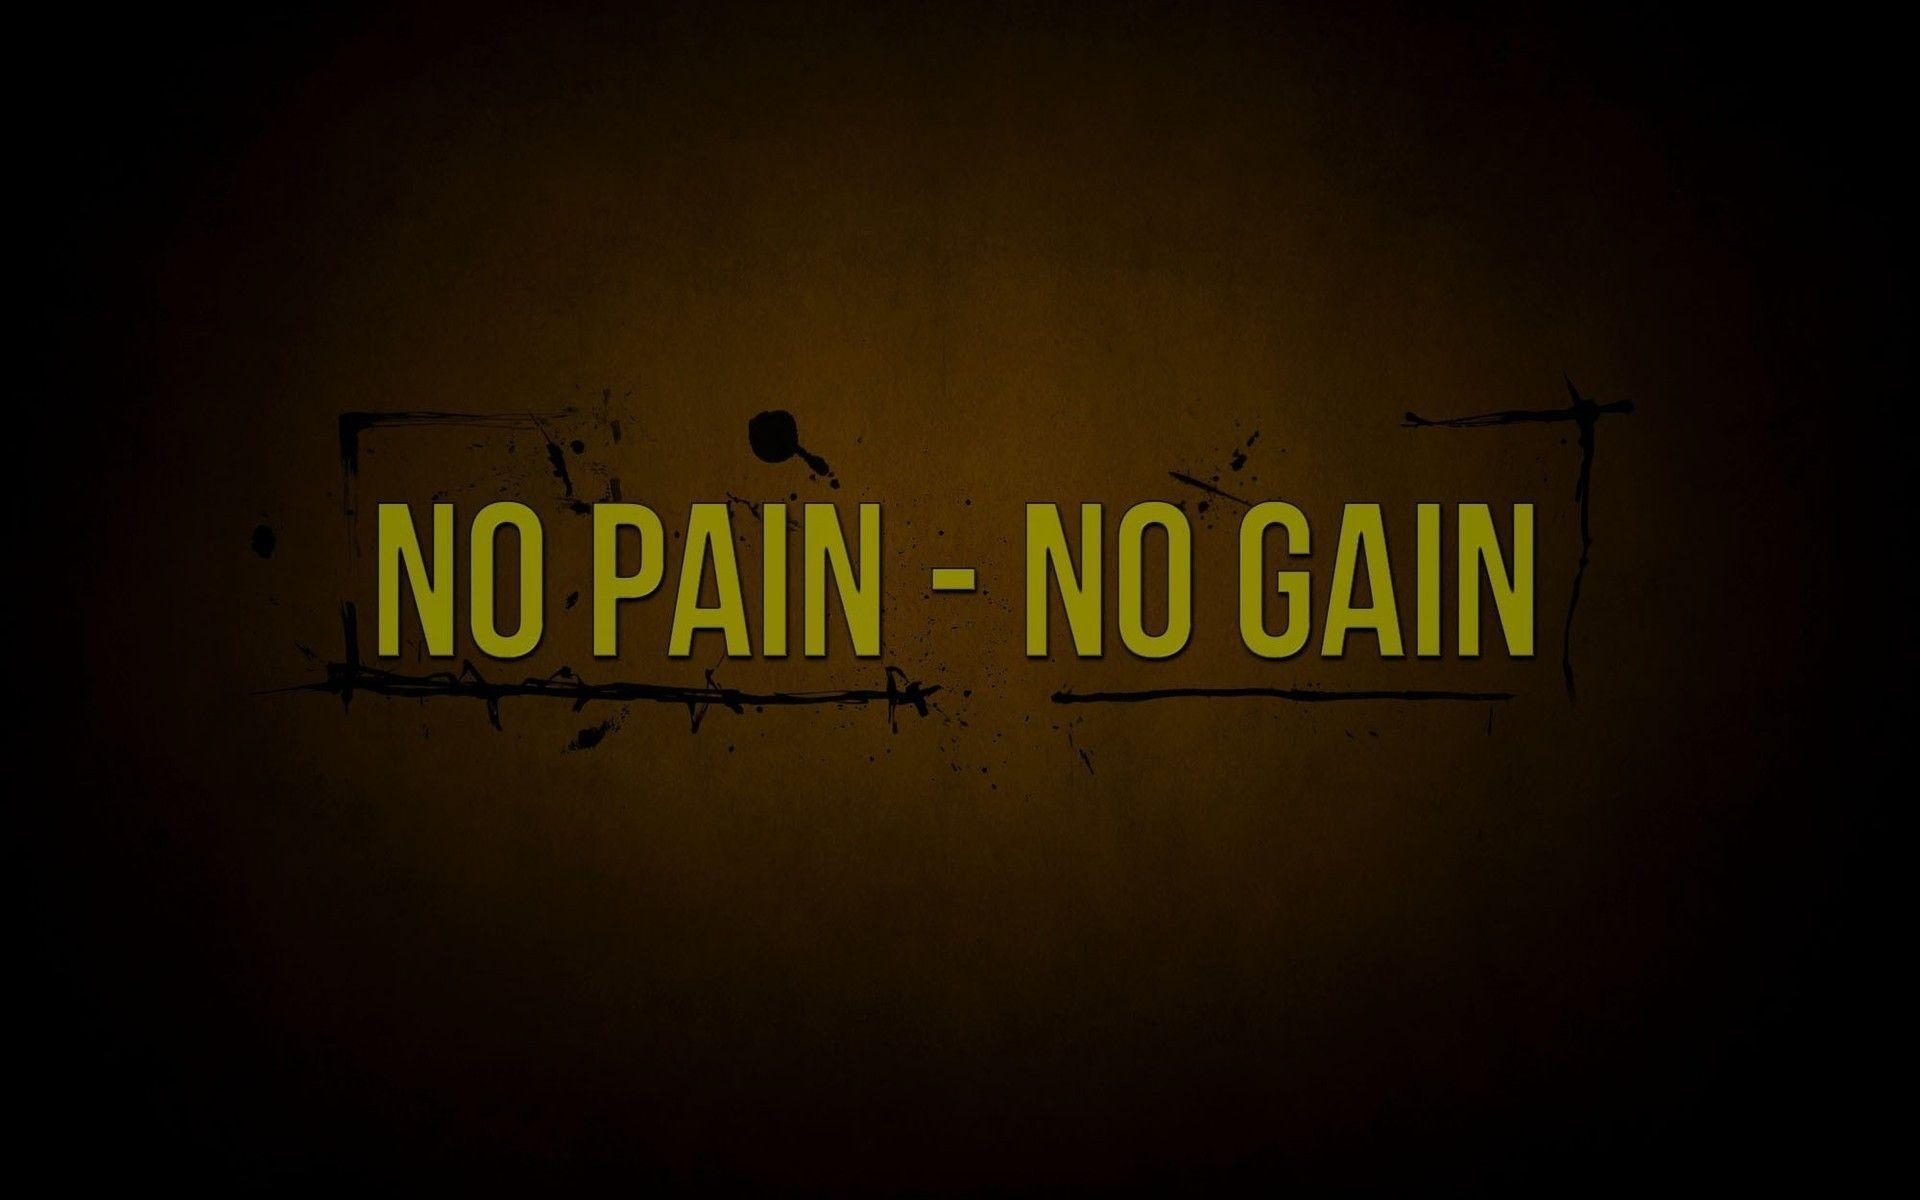 no pain no gain wallpapers - wallpaper cave